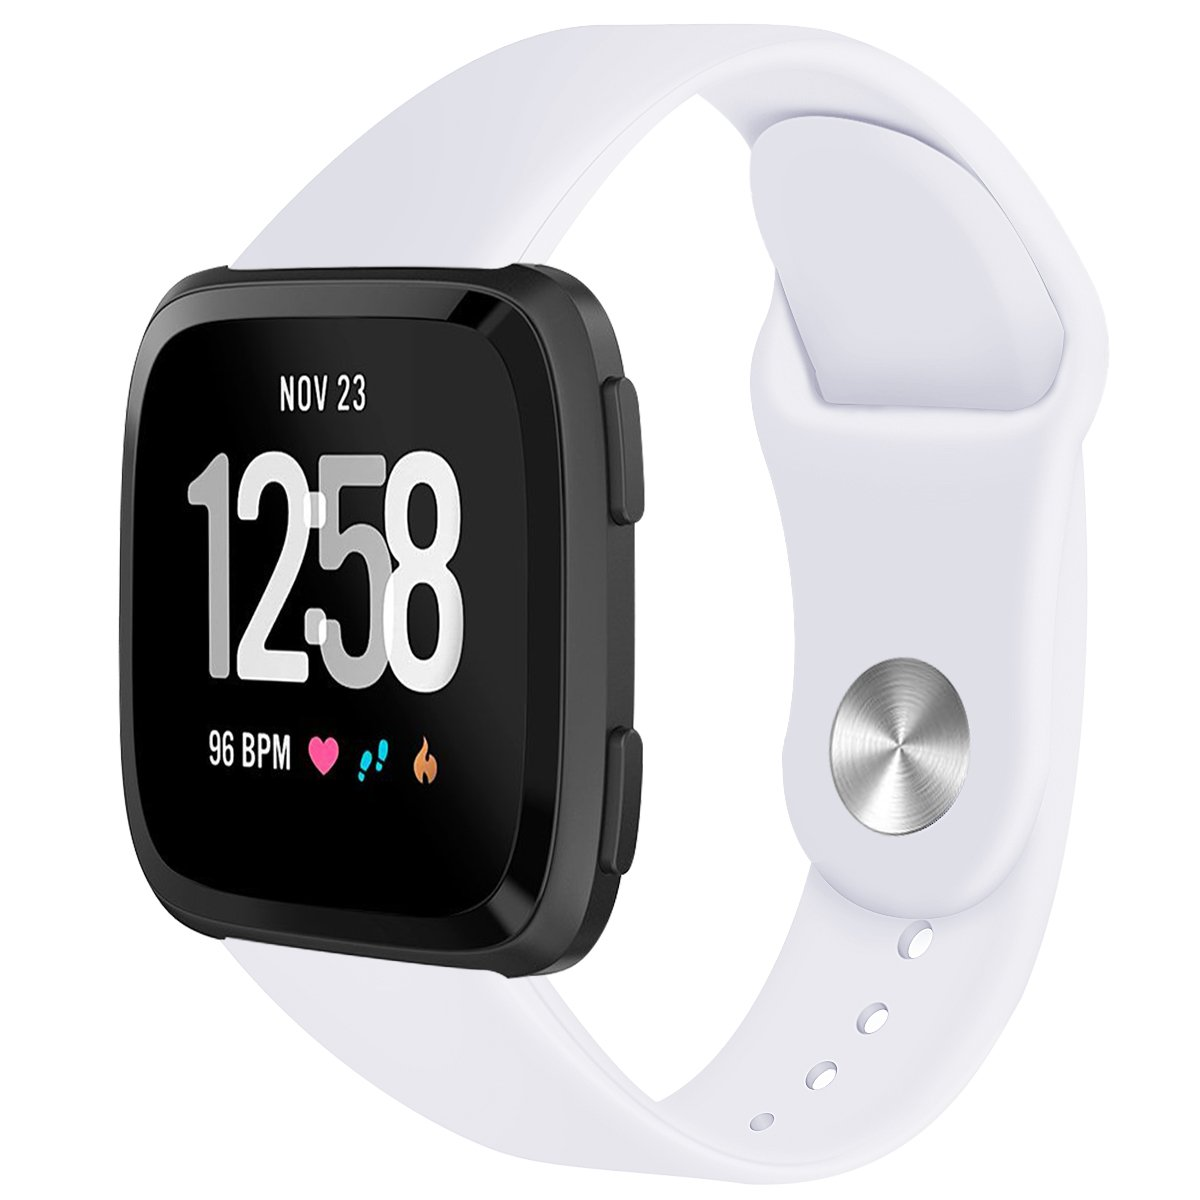 Yaberソフトシリコン交換ストラップスポーツバンドfor Fitbit Versa Smart Fitness Watch B07FVS93DT ホワイト Large